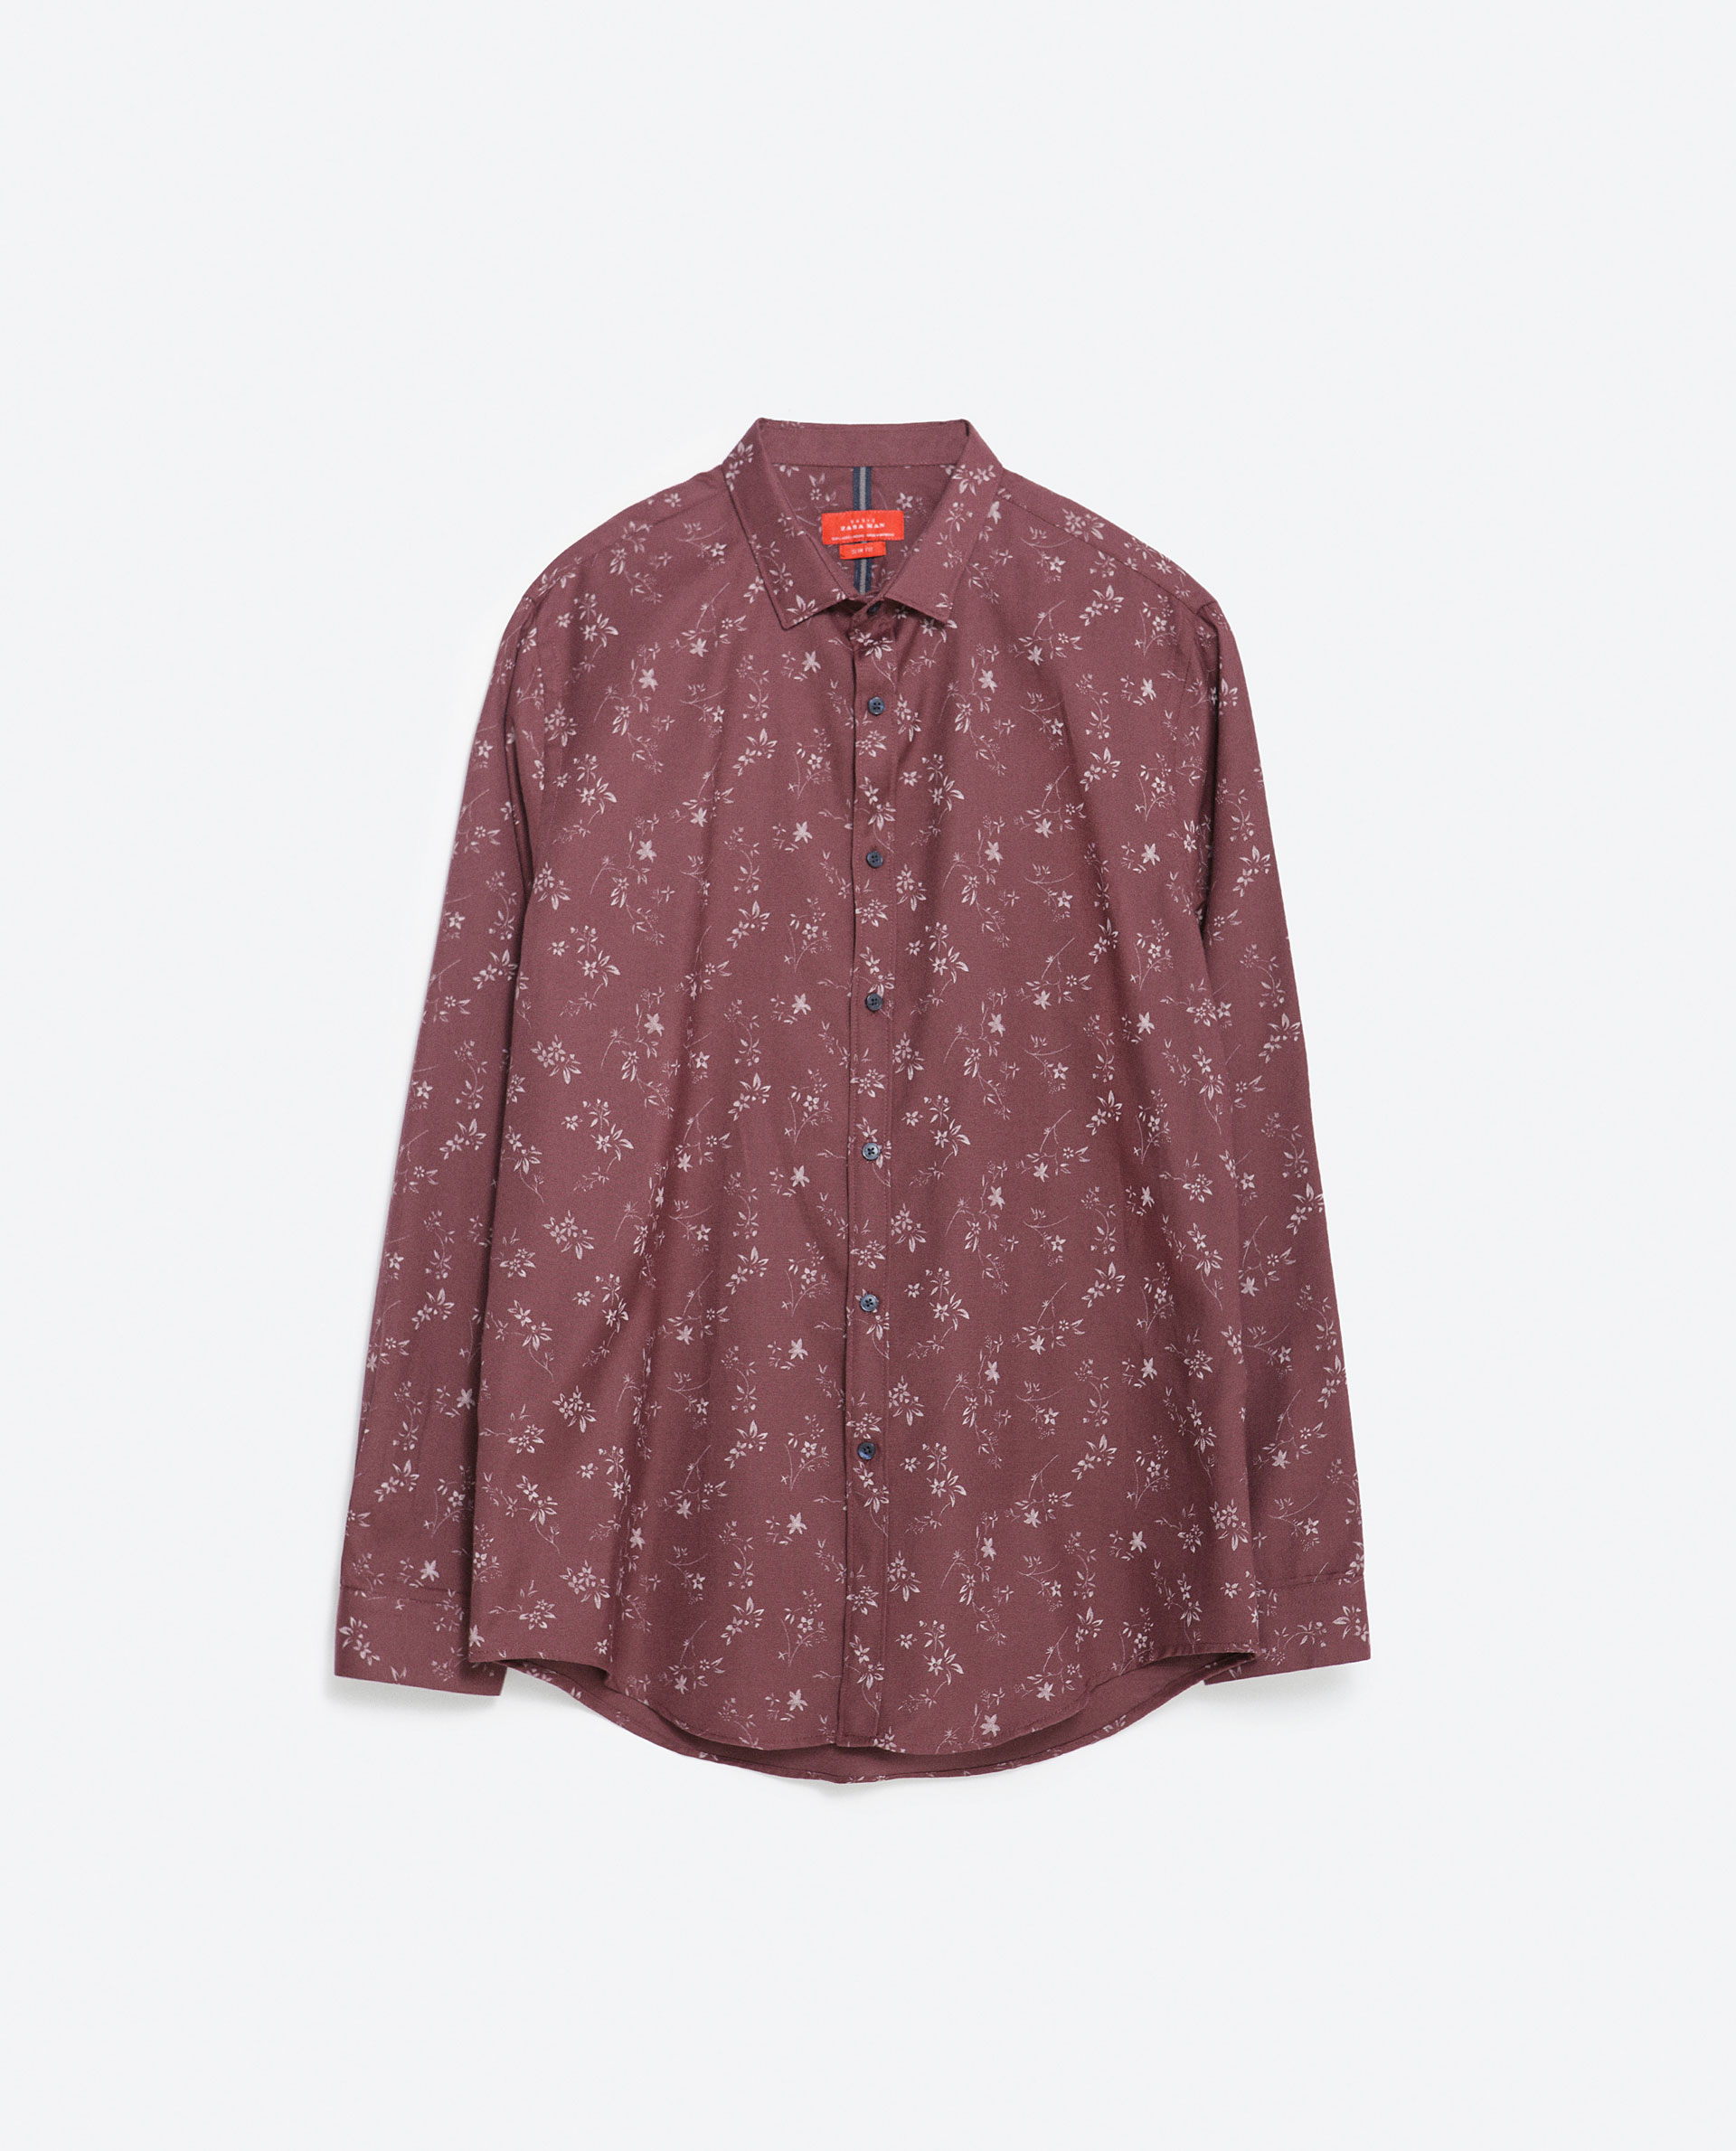 Zara floral shirt in purple for men lyst for Zara mens floral shirt